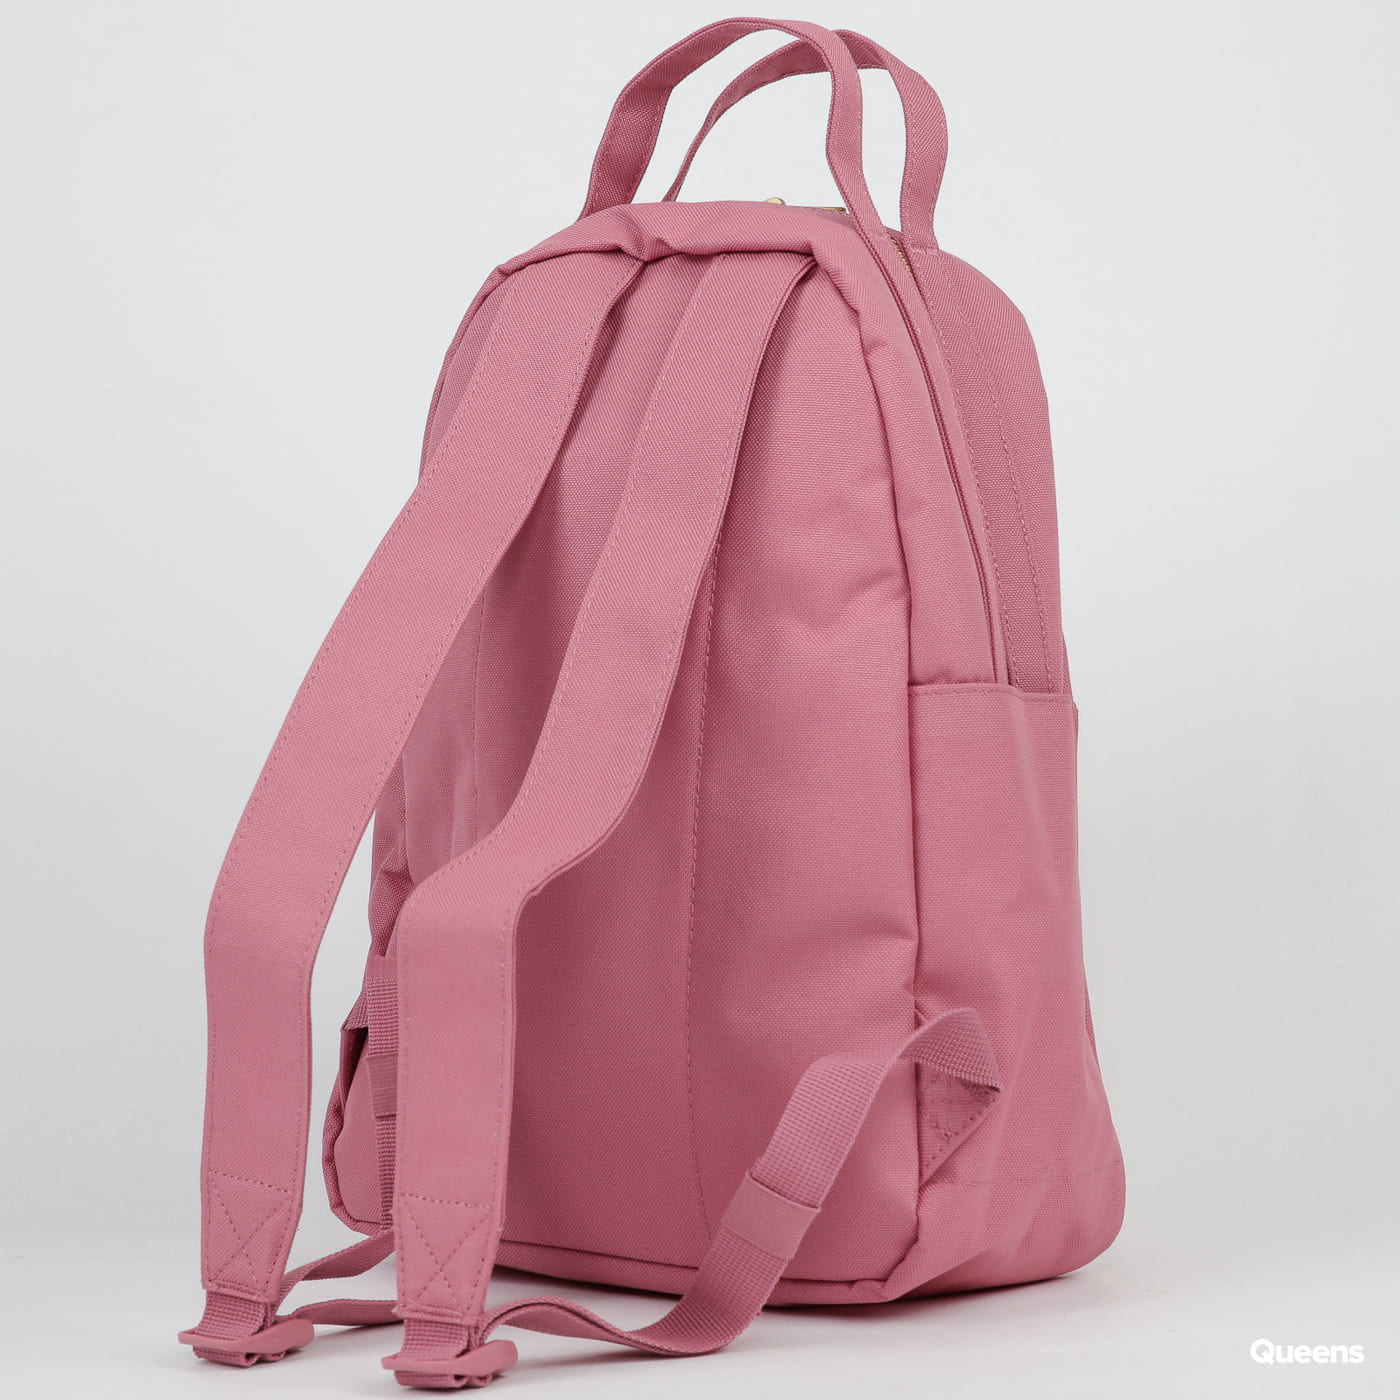 The Herschel Supply CO. Nova S Backpack ružový